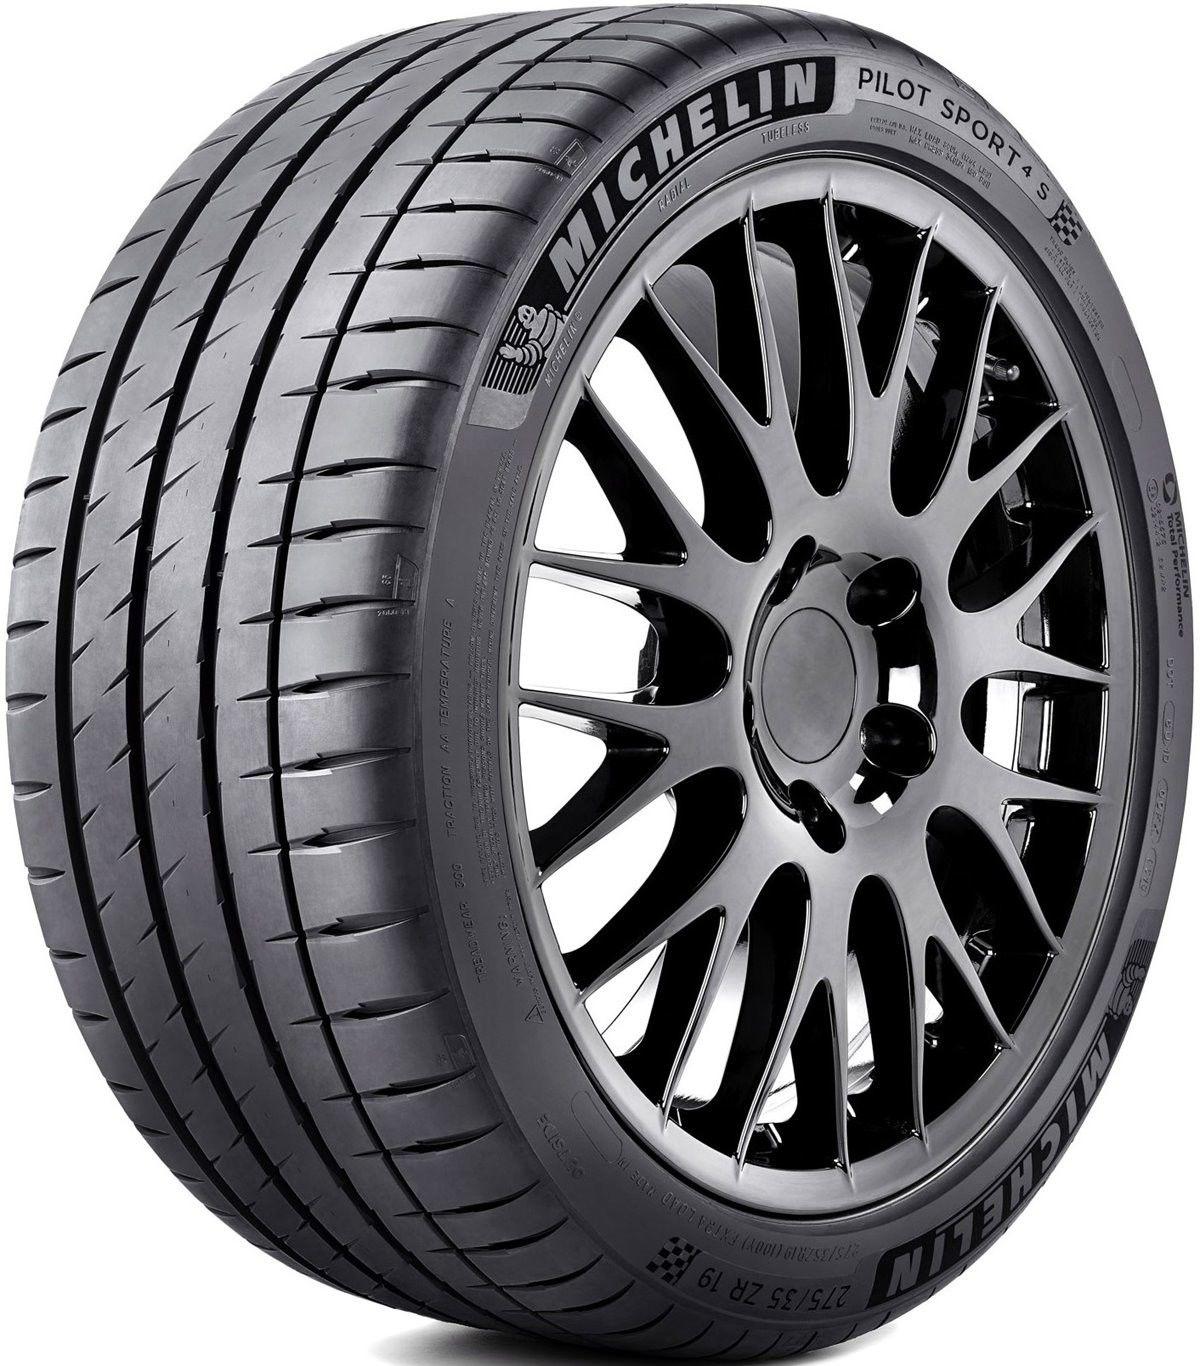 Michelin PILOT SPORT 4 S 275/35 R 96